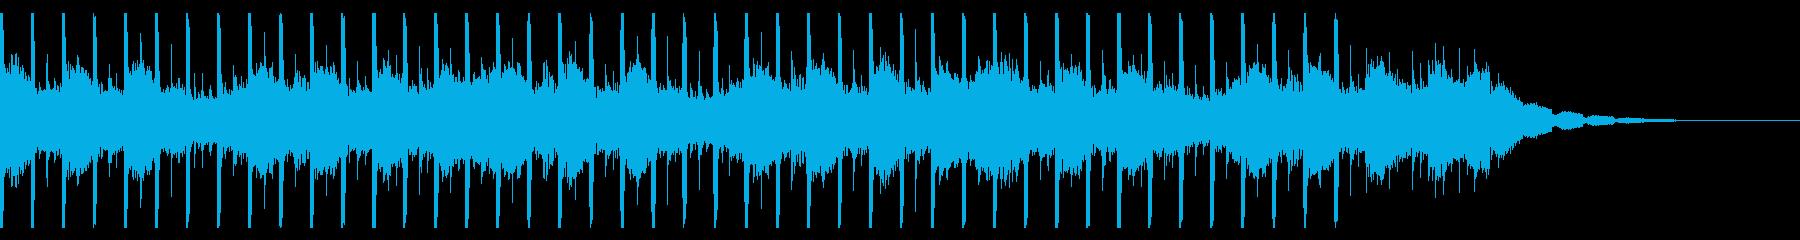 The Construction (30 Sec)'s reproduced waveform